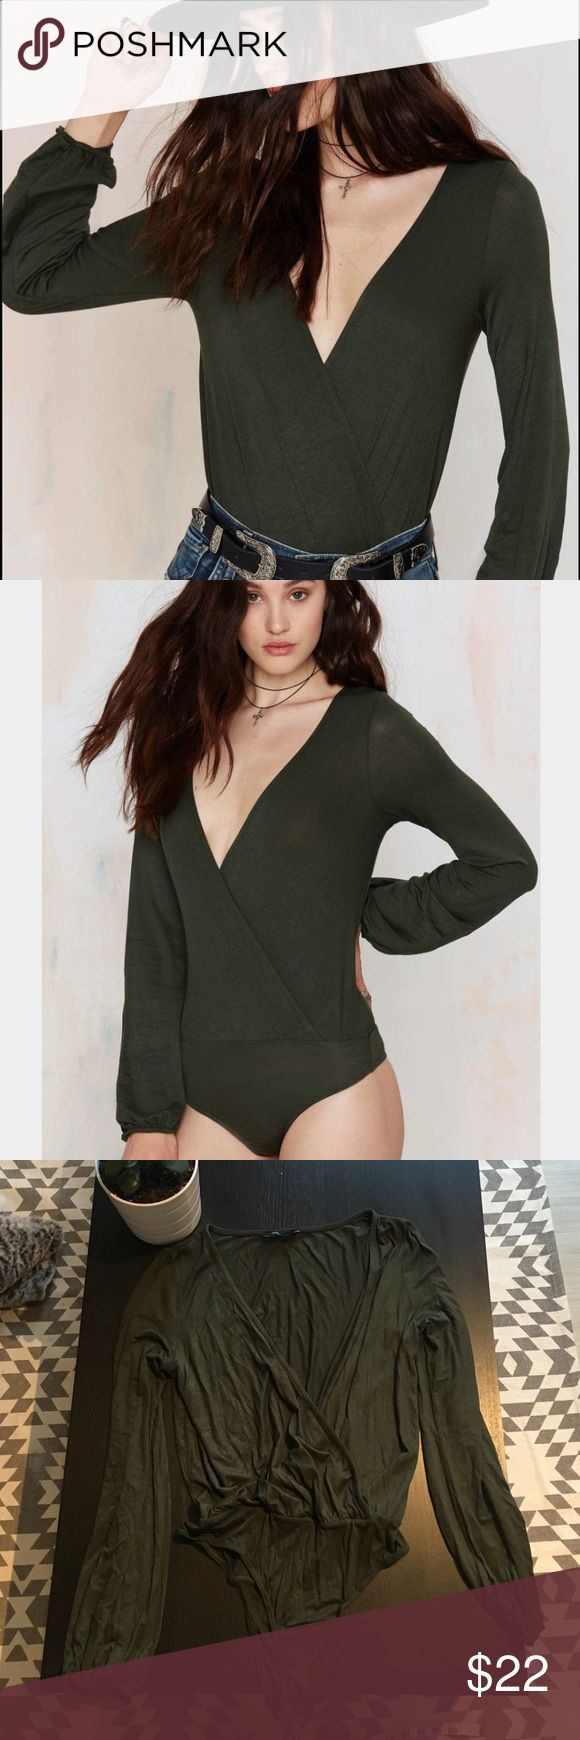 NWOT Nast Gal Camille bodysuit NWOT Nasty Gal Olive Green plunge front bodysuit. Size Large. Nasty Gal Tops Blouses